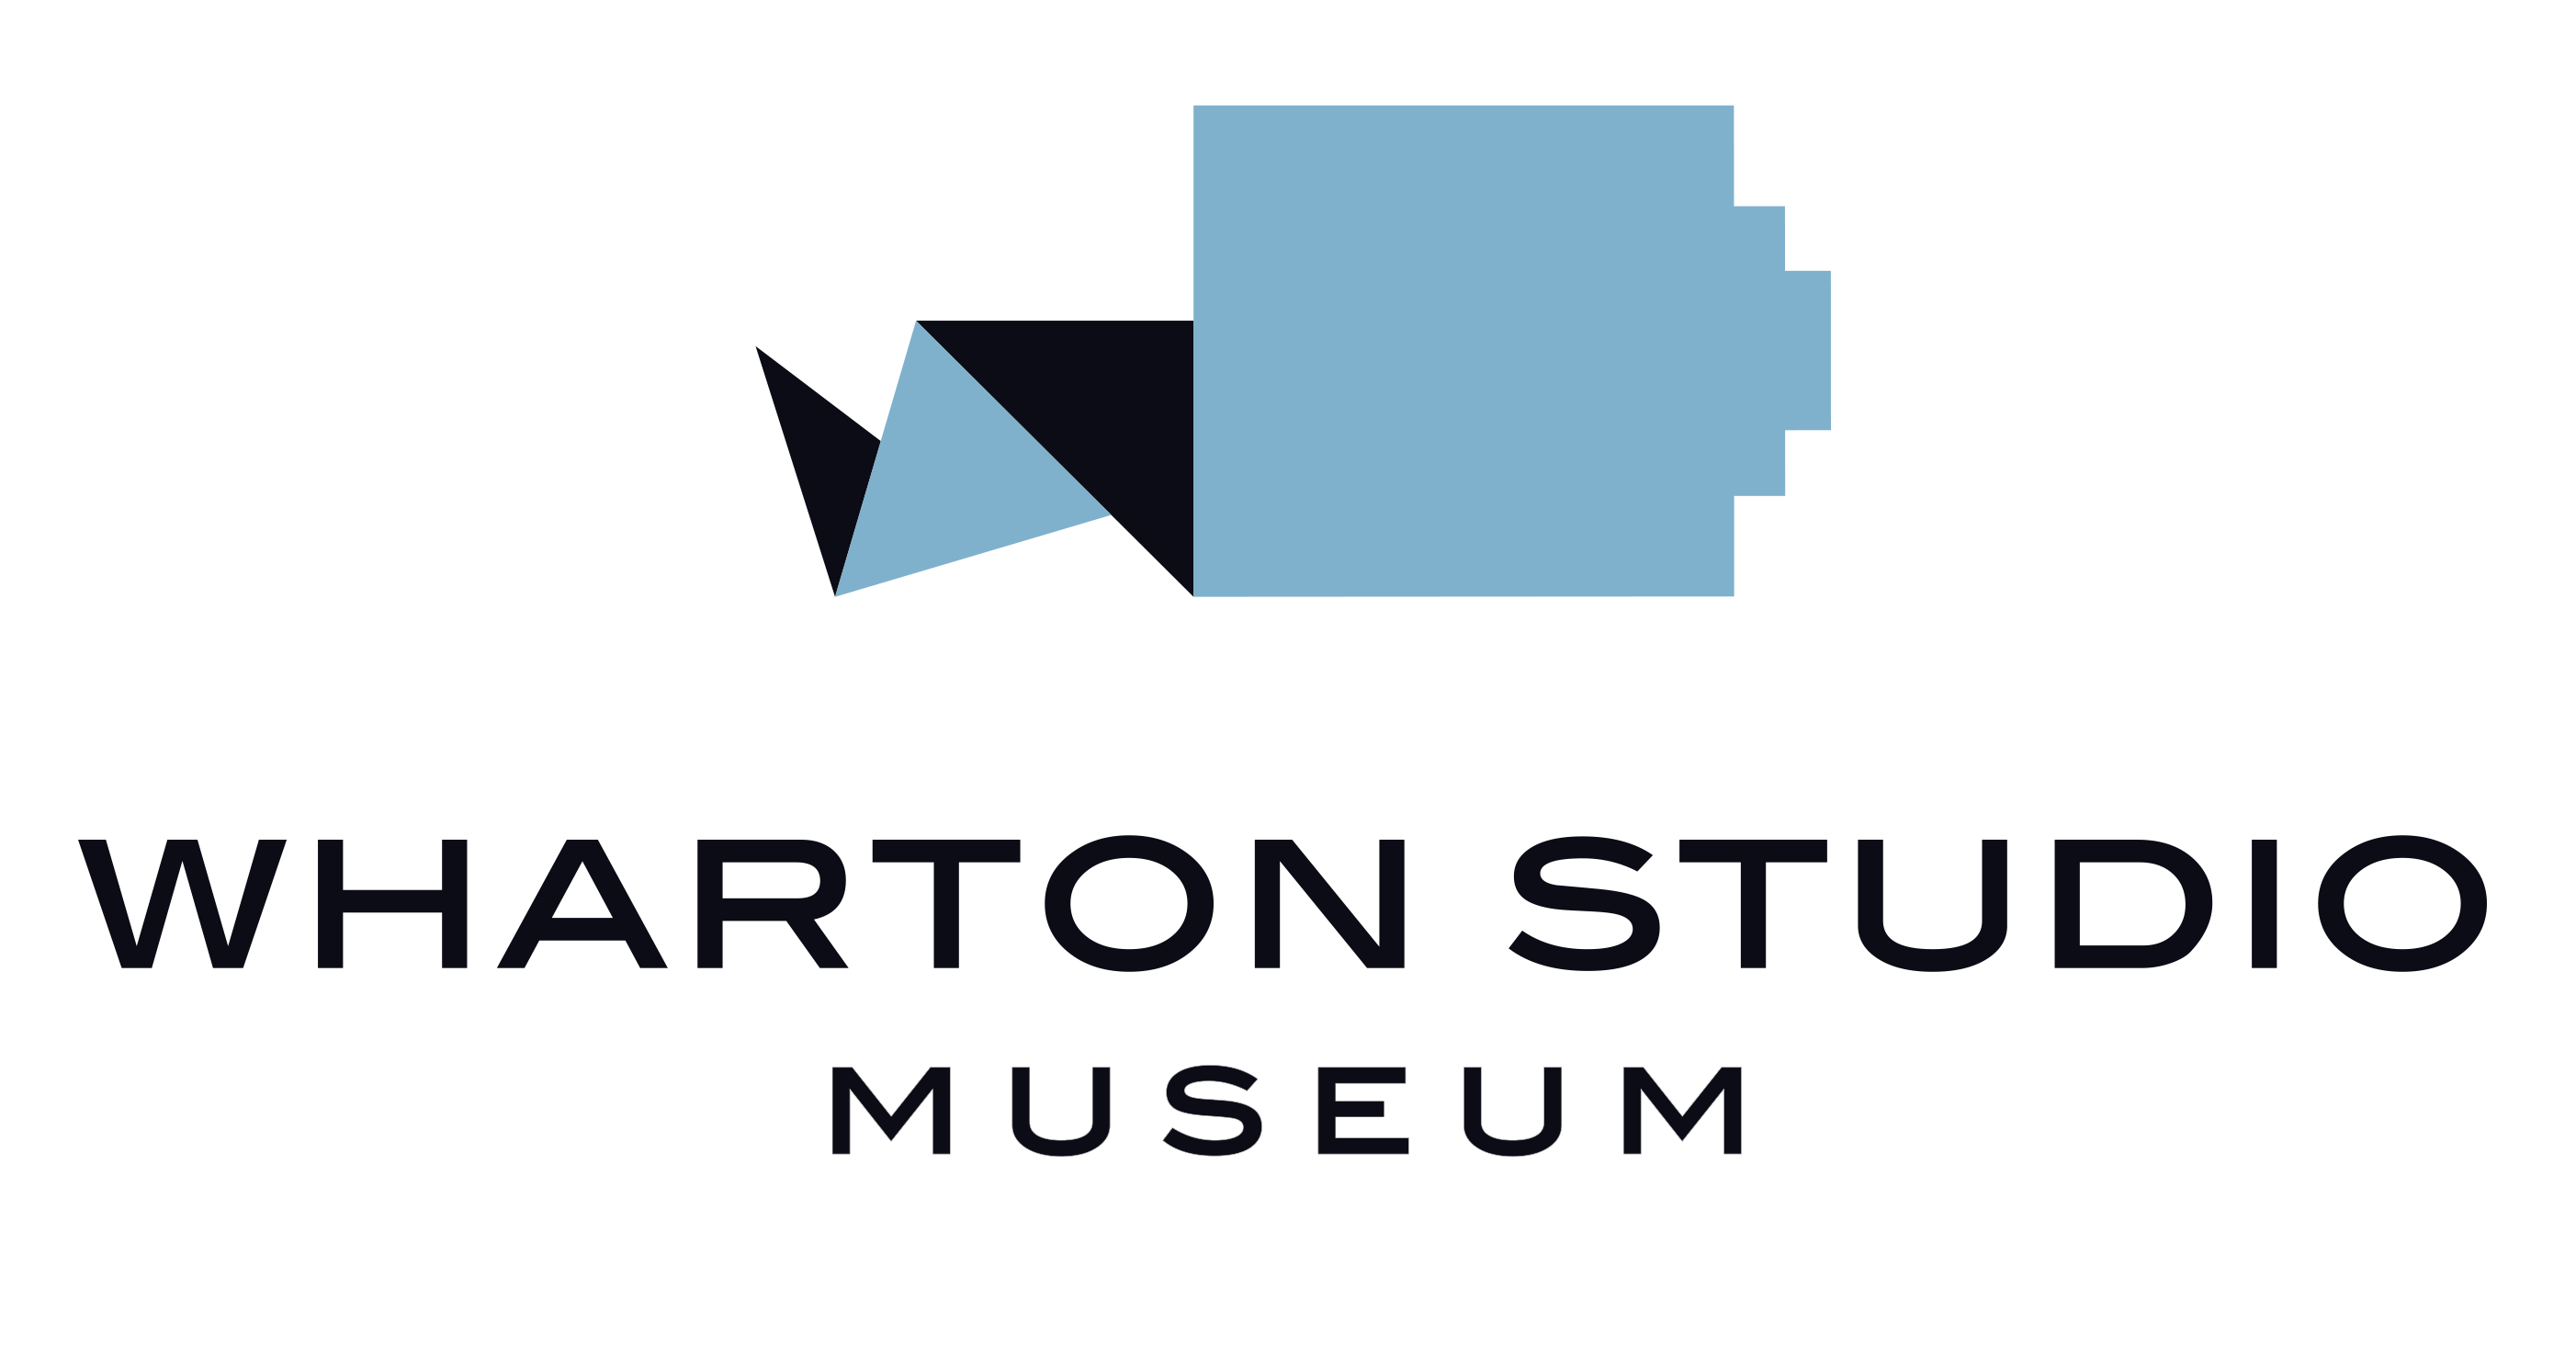 Wharton Studio Museum - Ithaca, NY